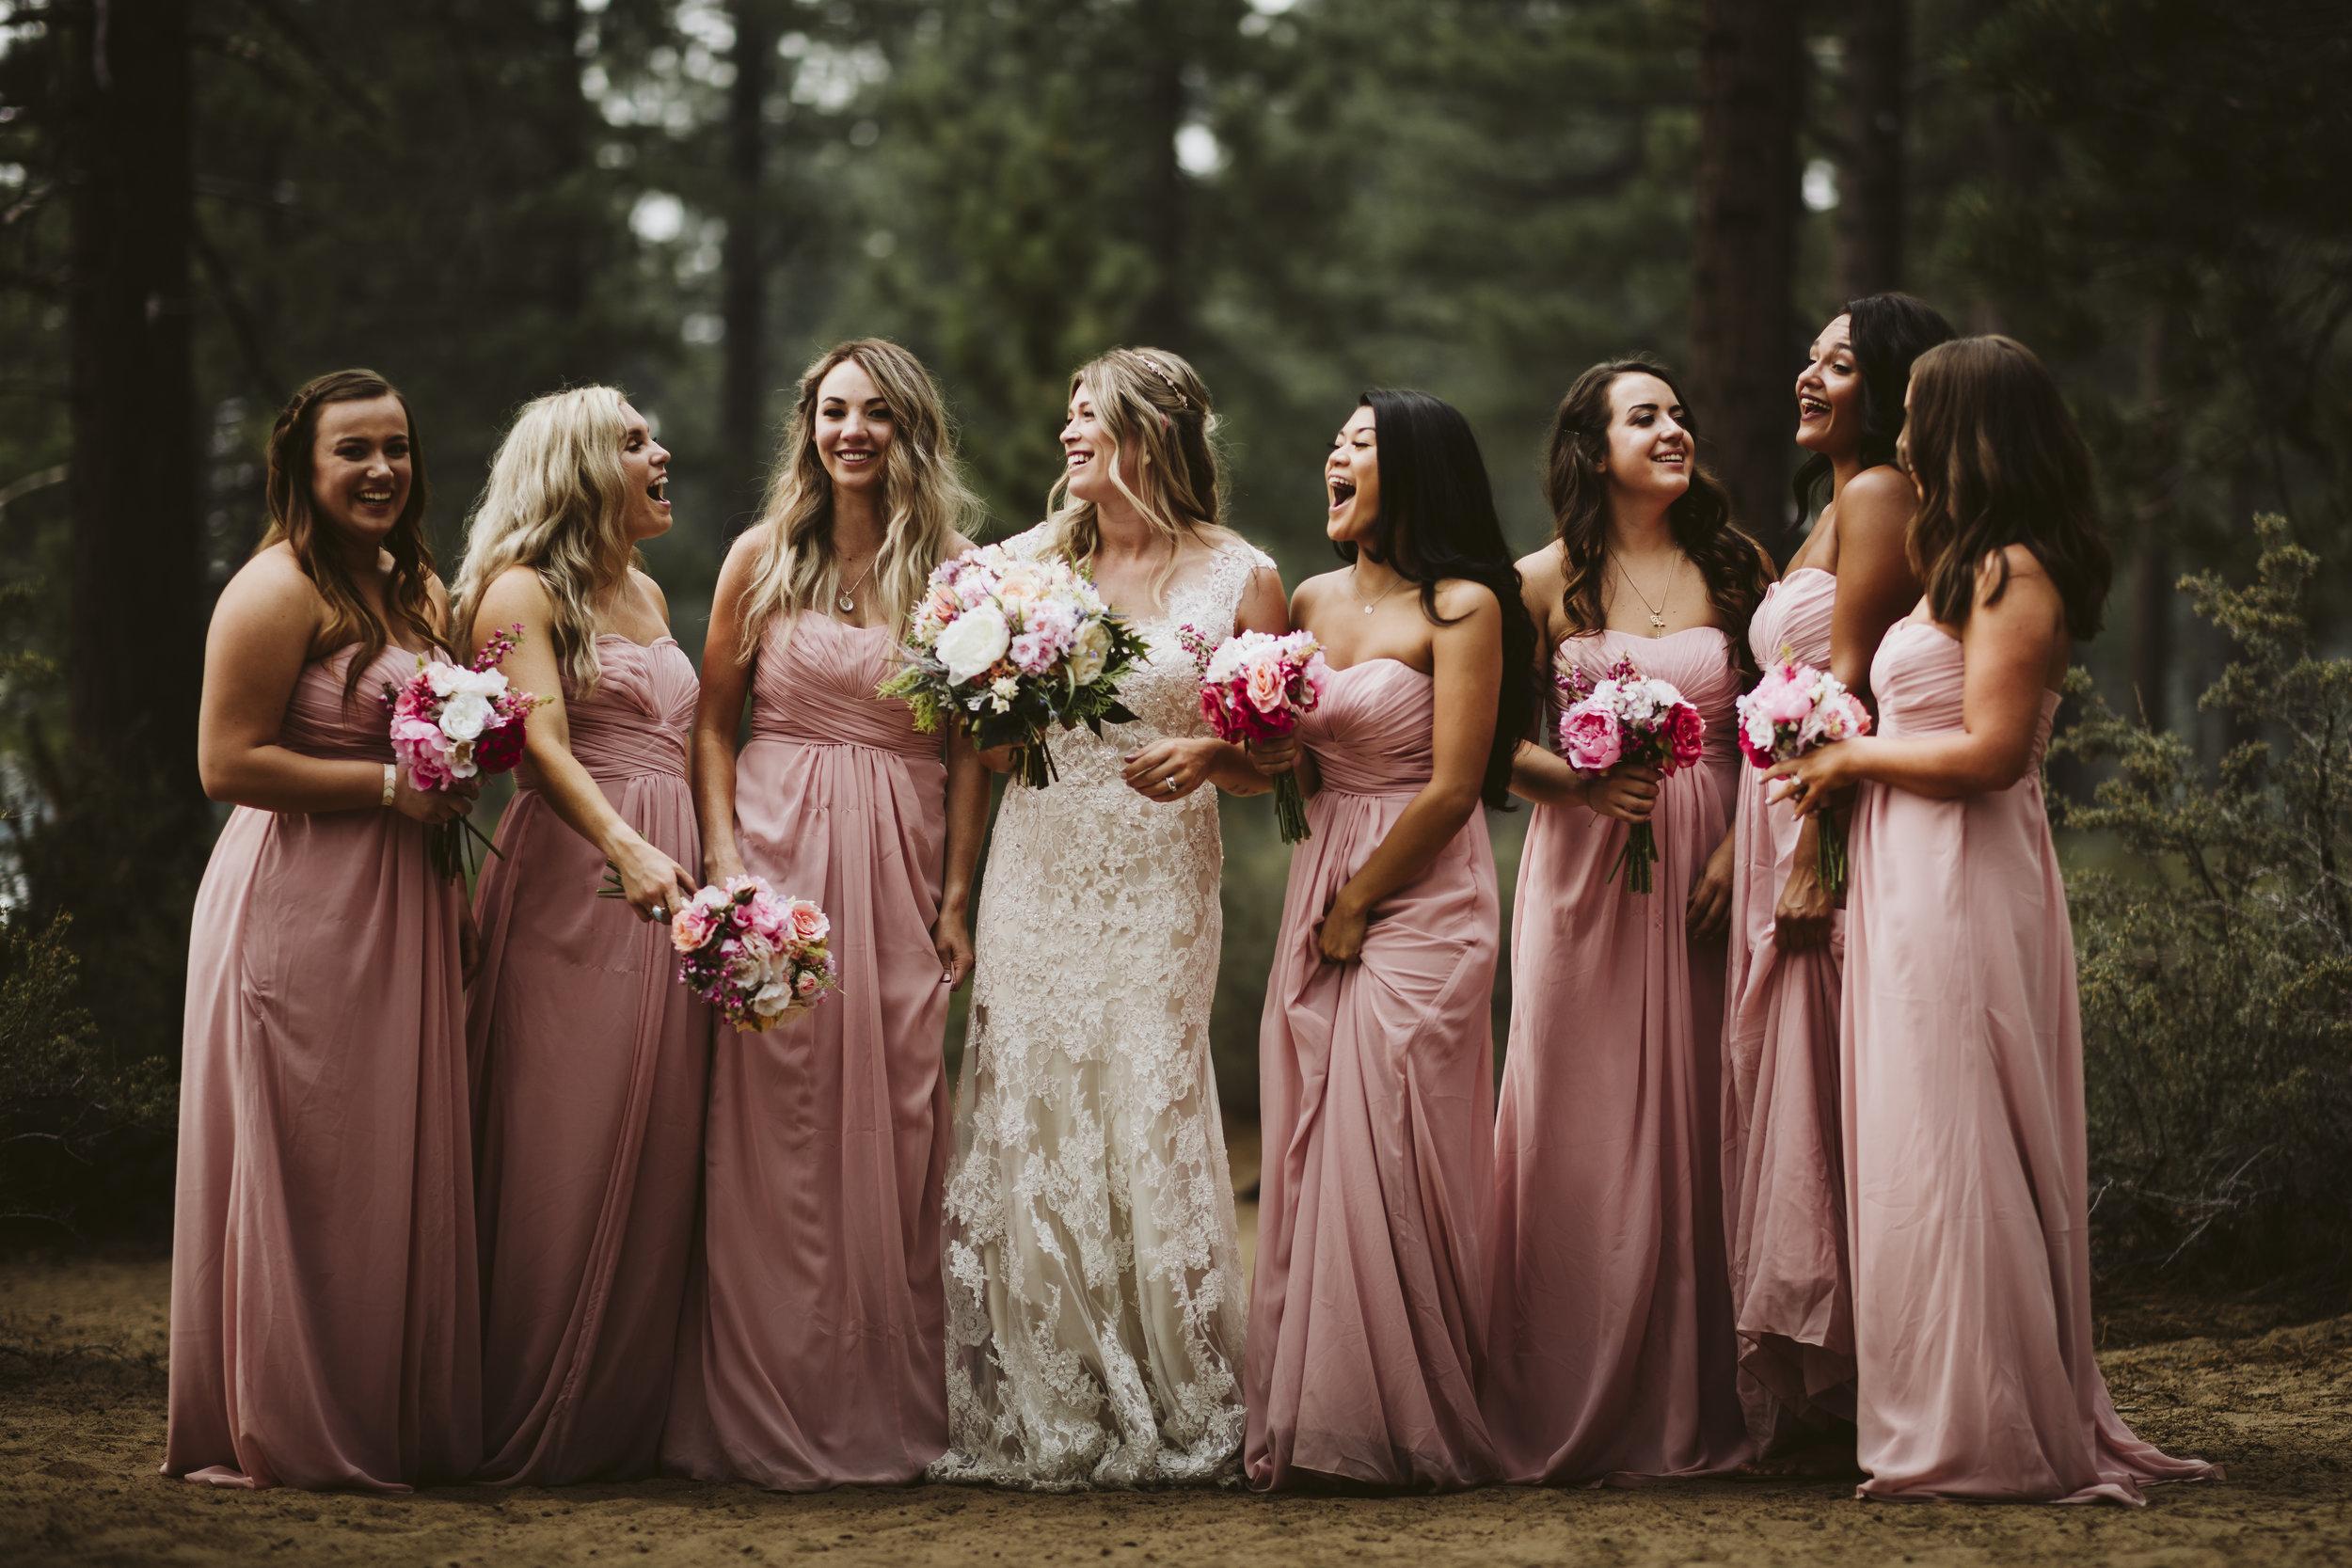 _P8A4506vild-vild photography-photography-wedding-wedding photography-tahoe-lake tahoe-lake tahoe wedding photographer-nevada wedding photographer-mountain wedding.jpg